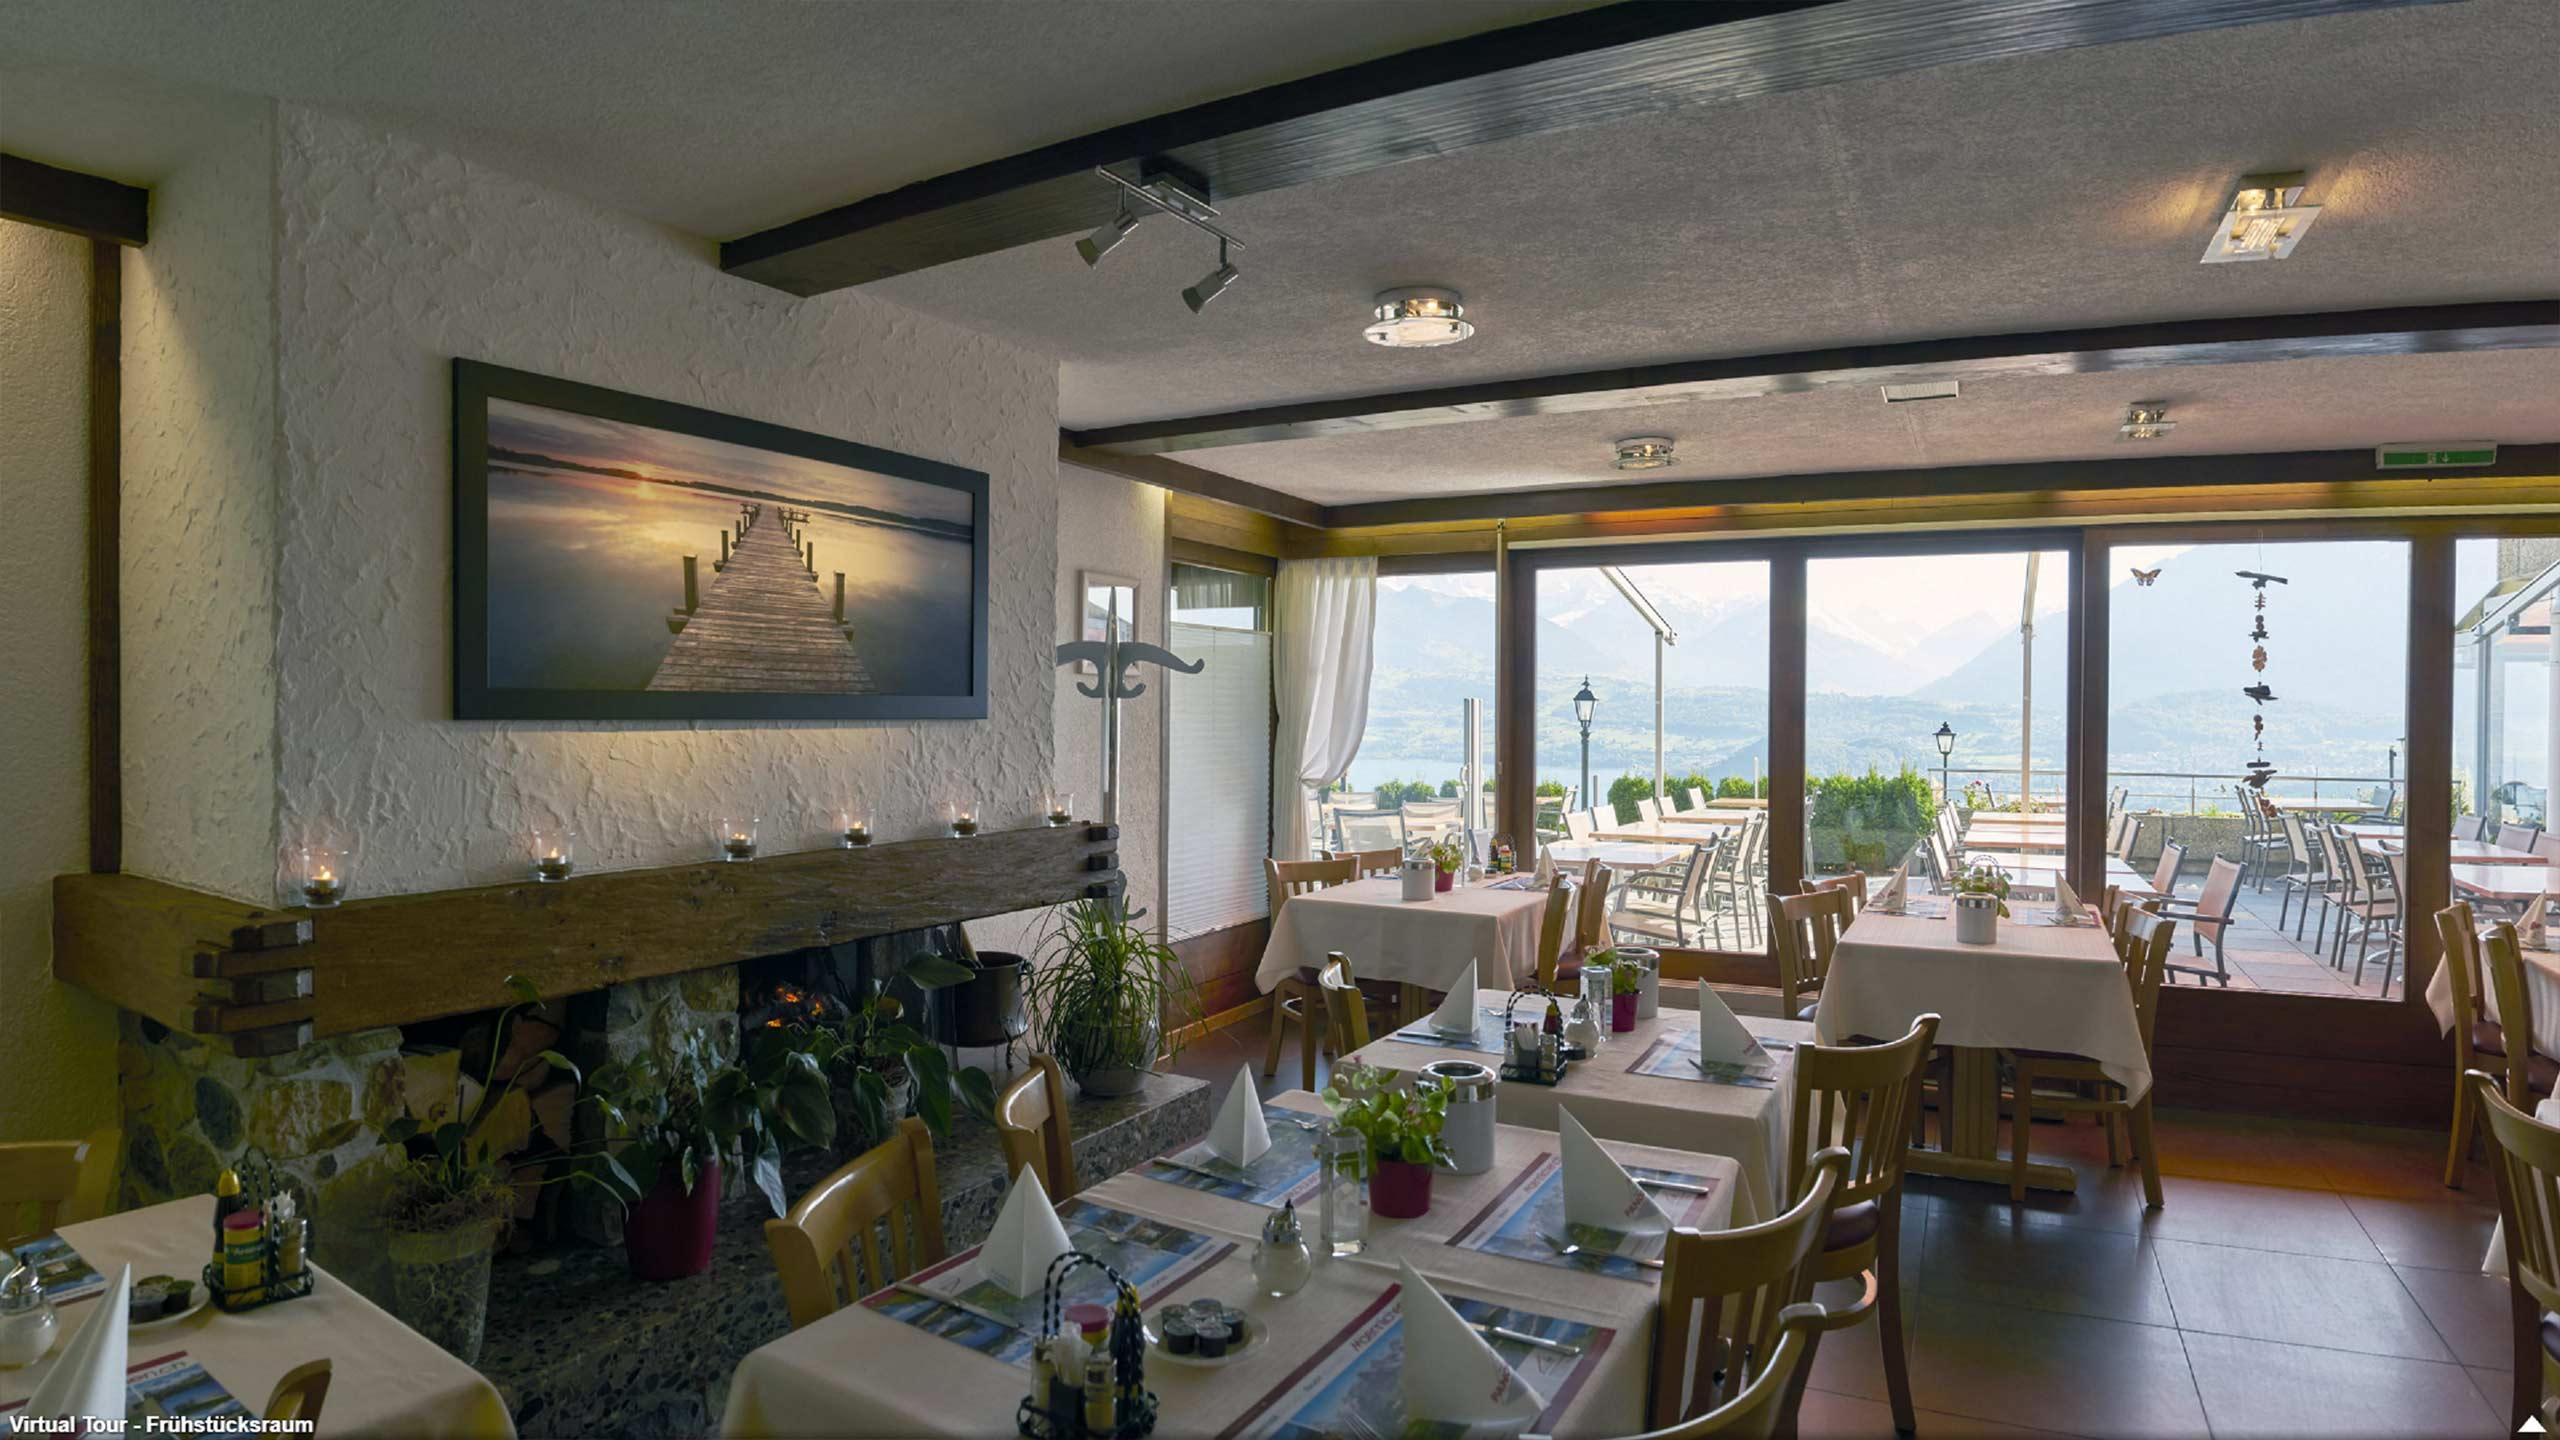 hotel-restaurant-panorama-aeschlen-fruehstuecksraum.jpg